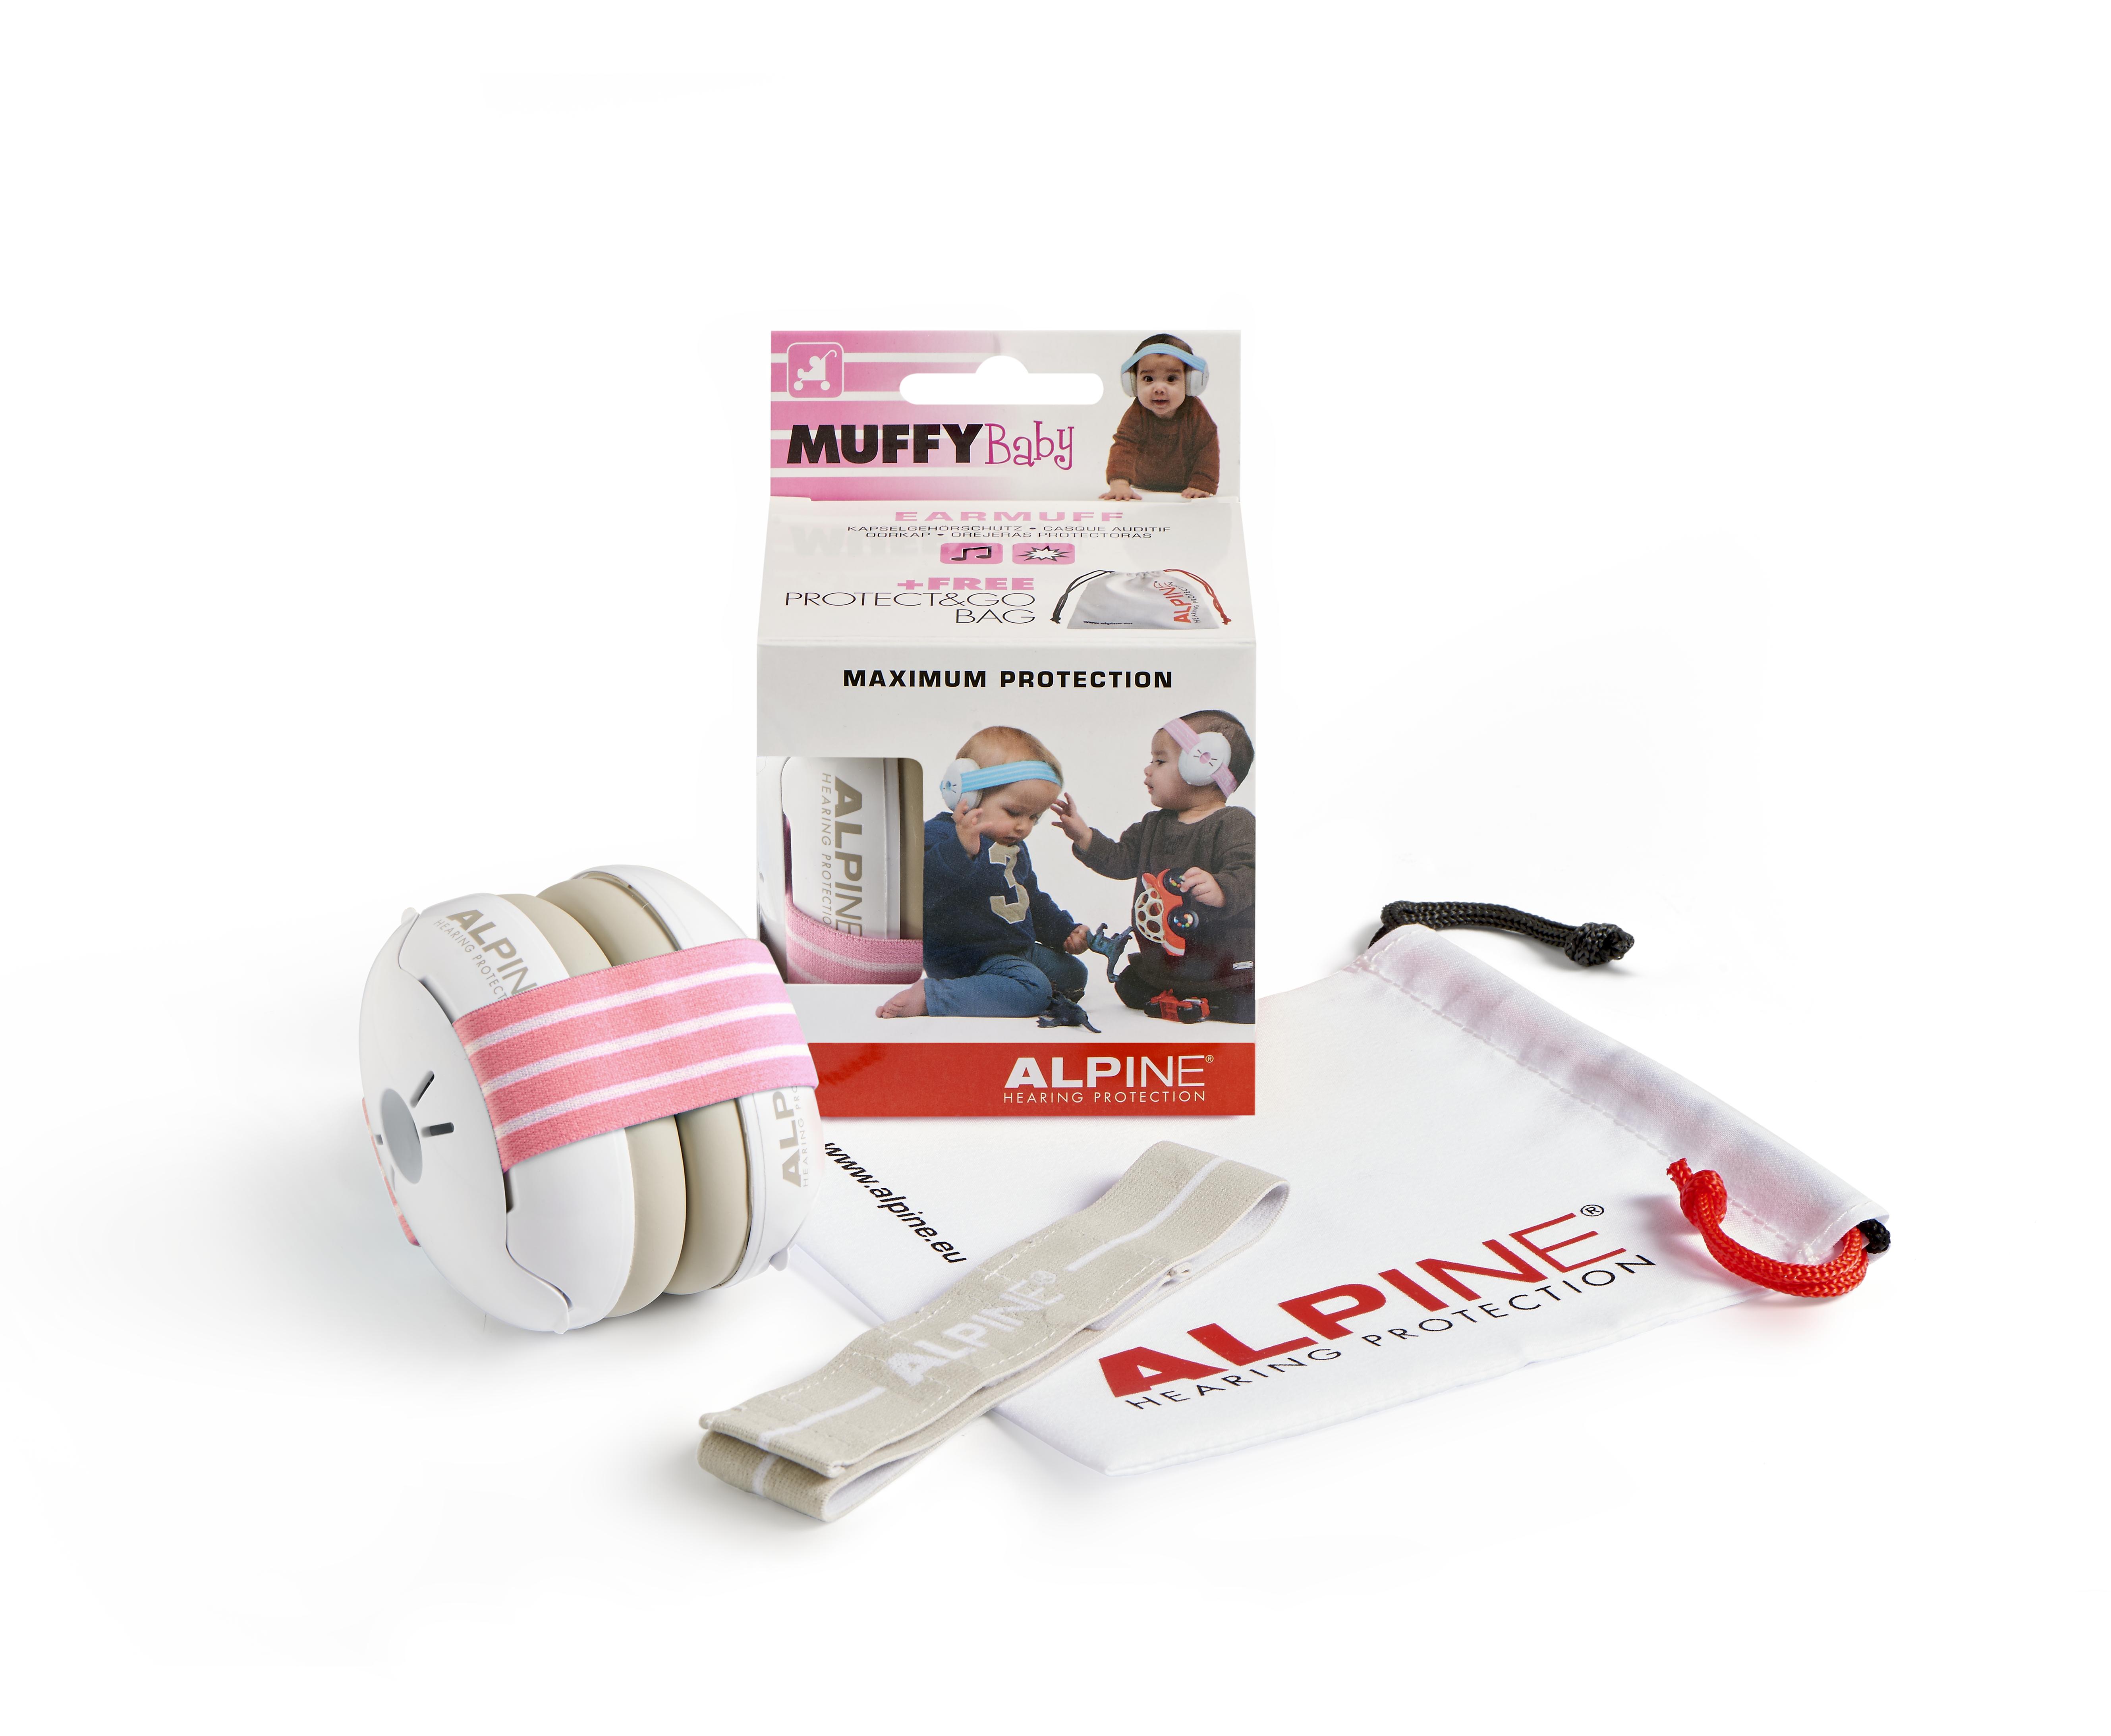 alpine-muffy-pink-packshot